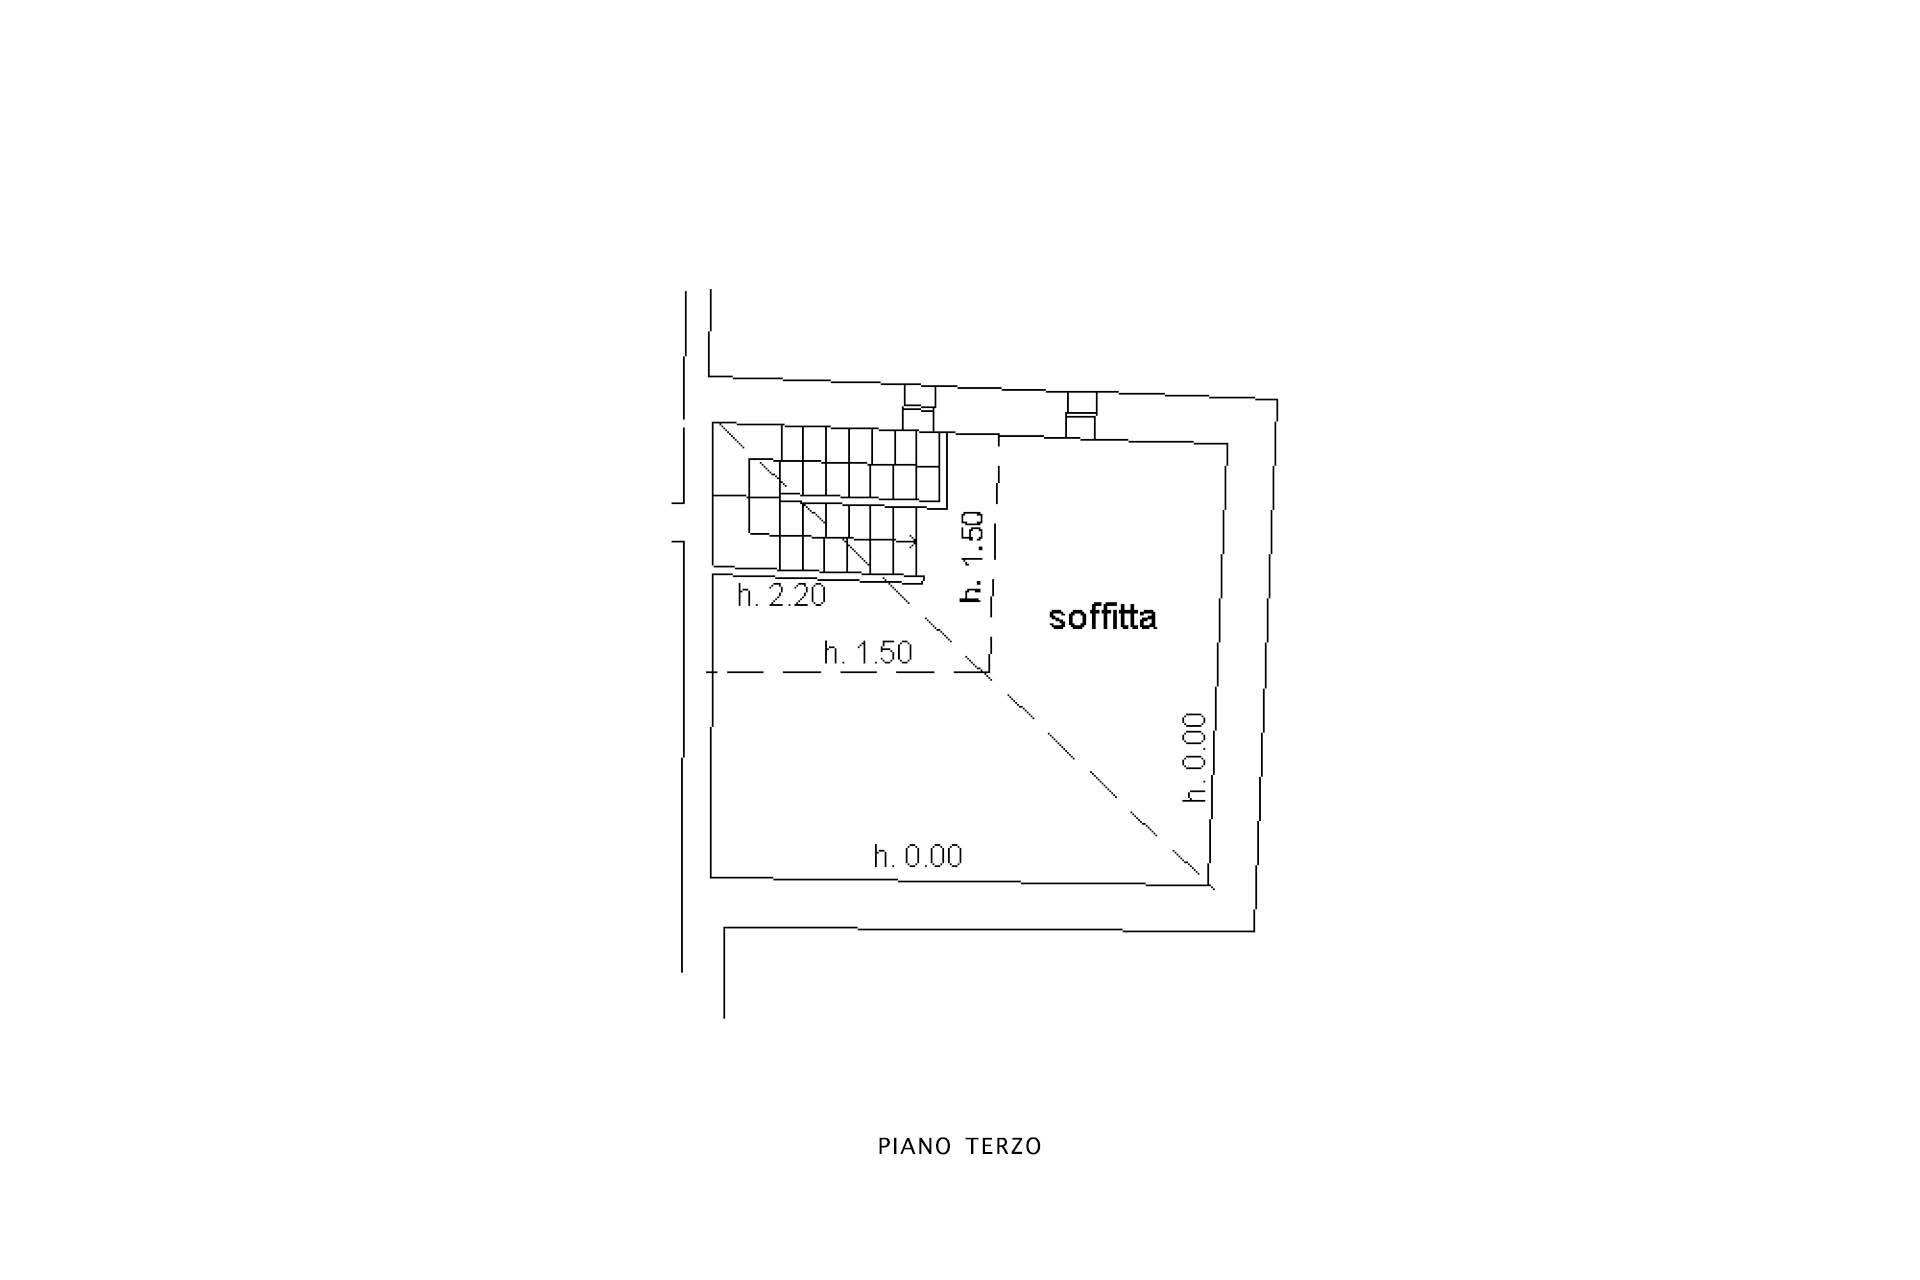 Planimetria soffitta